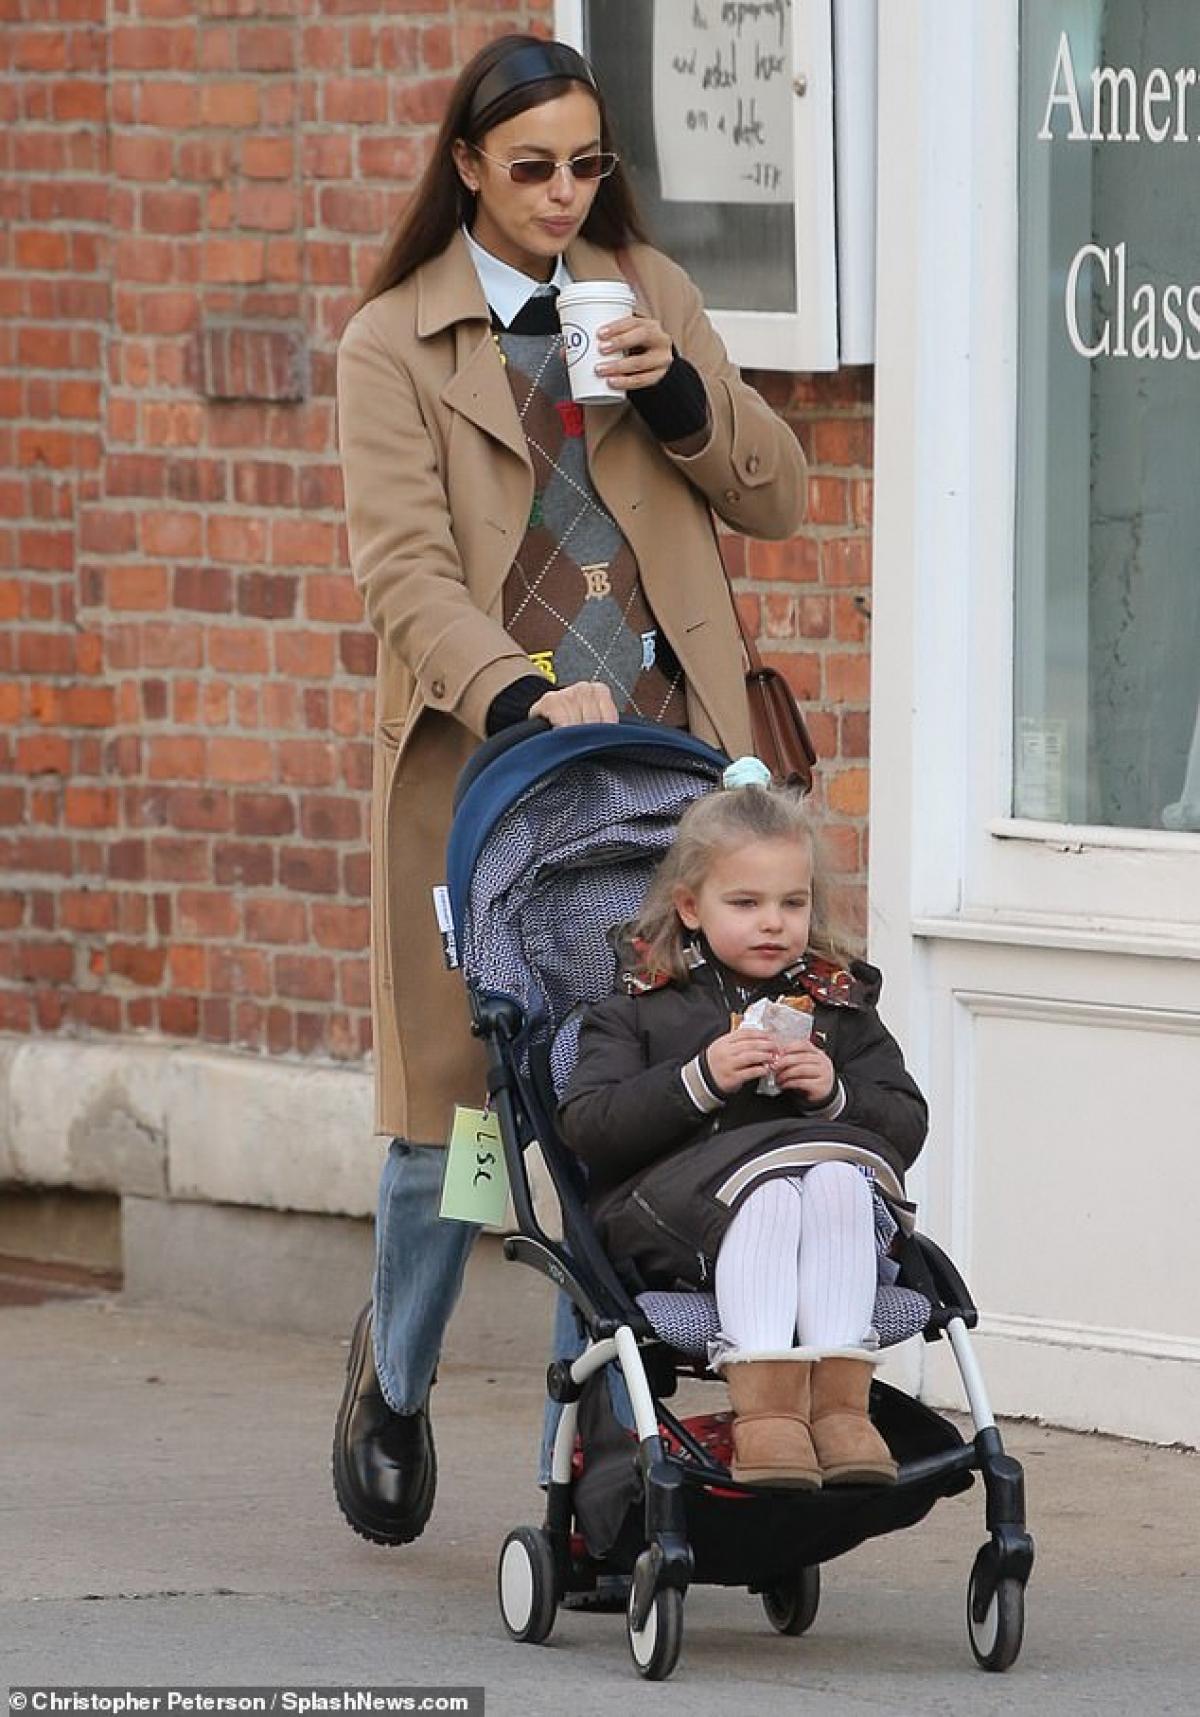 Irina Shayk đưa con gái Lea đi ăn sáng ở New York vừa qua.